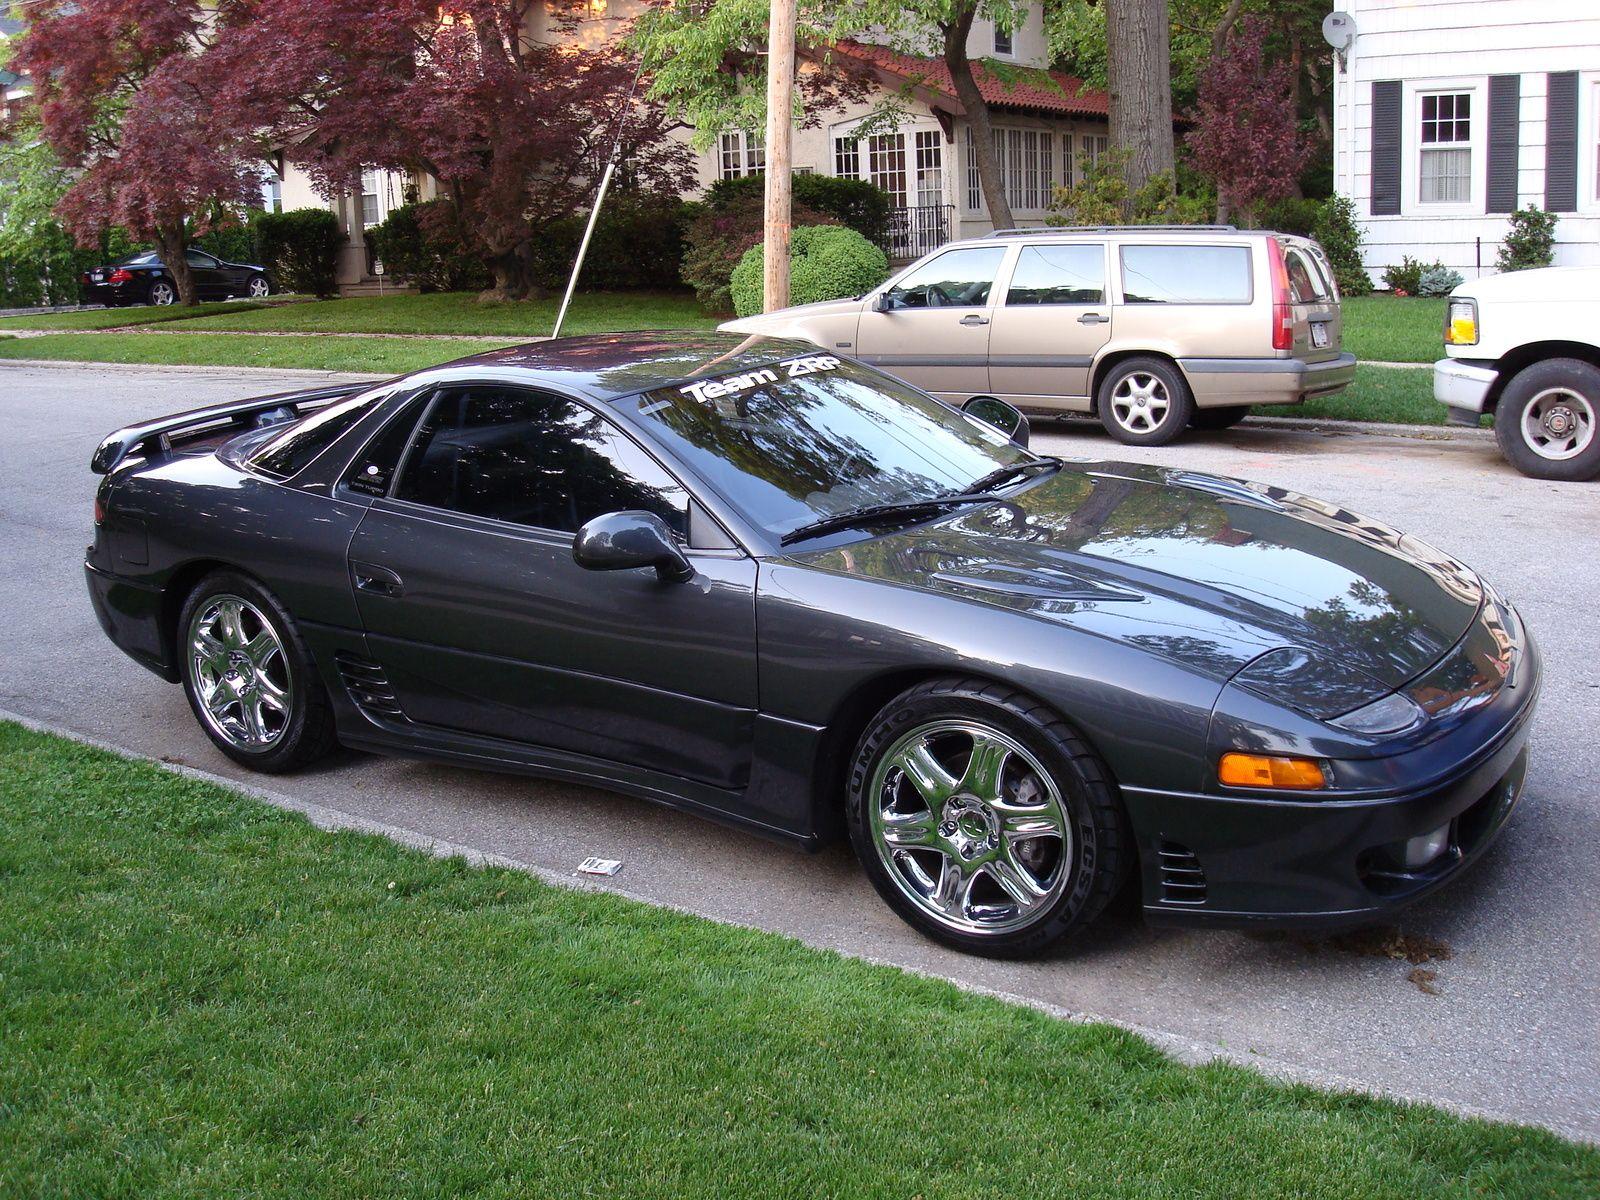 1992 Mitsubishi 3000gt 2 Dr Vr 4 Turbo Awd Hatchback Automotive